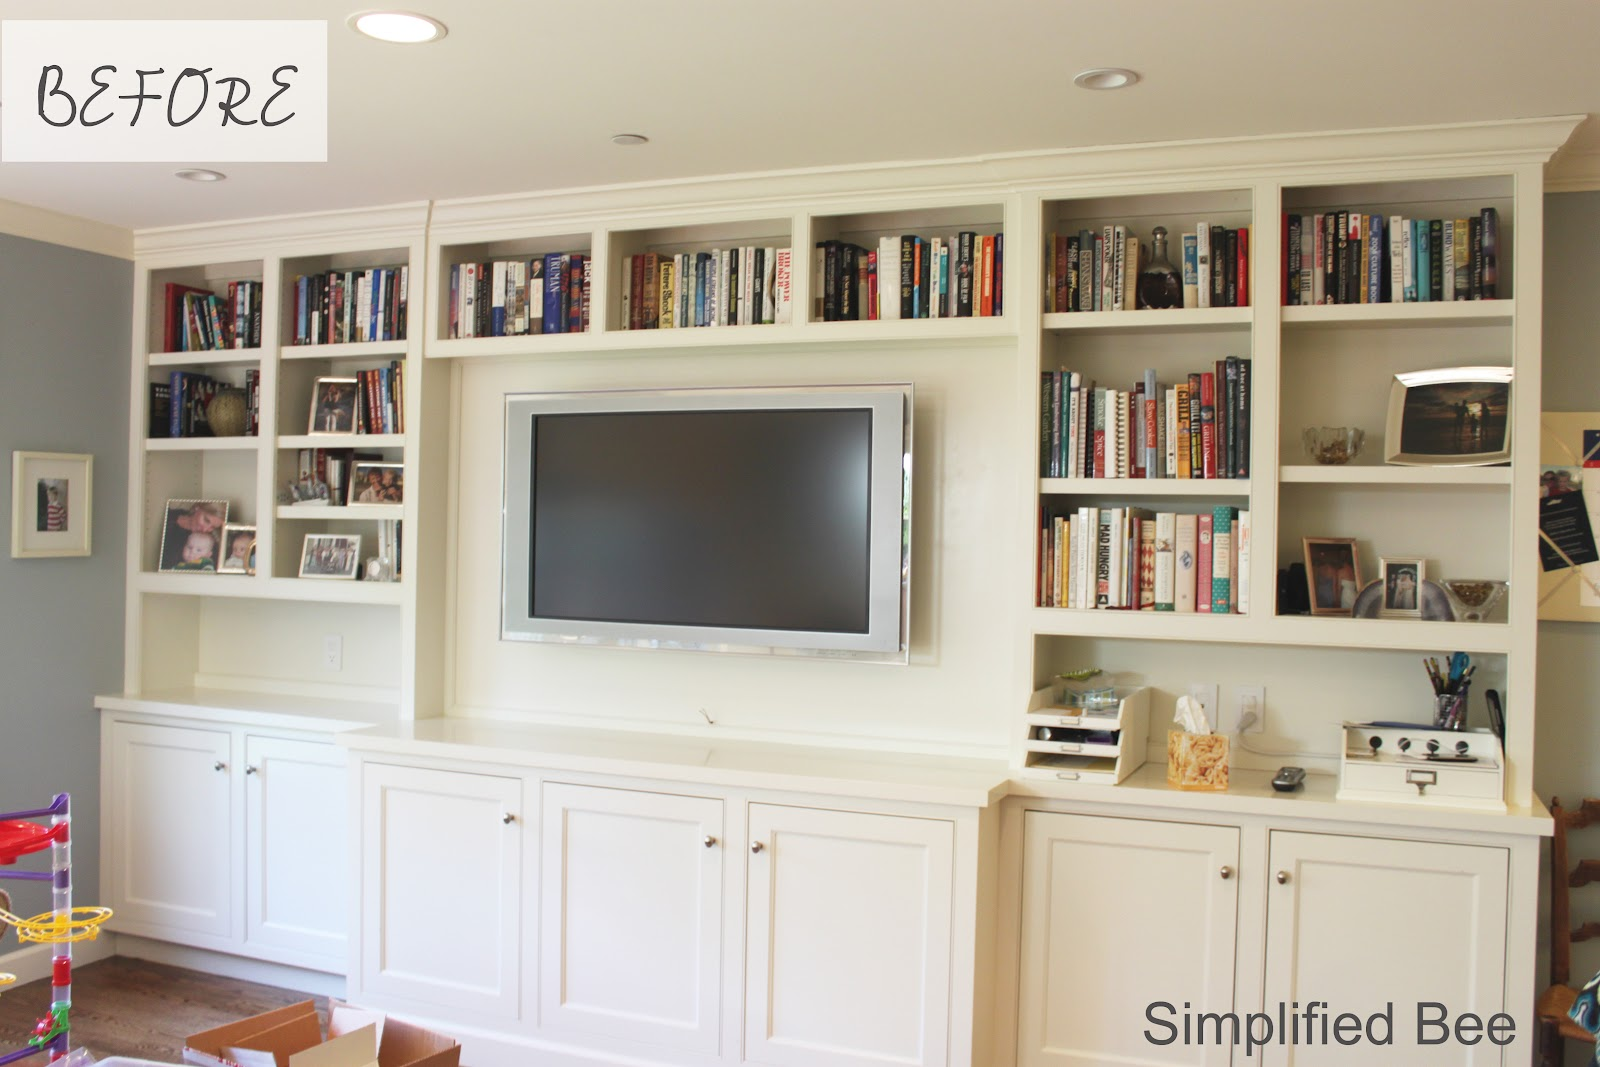 Bookshelf Styling Before After Michaela Noelle Designs